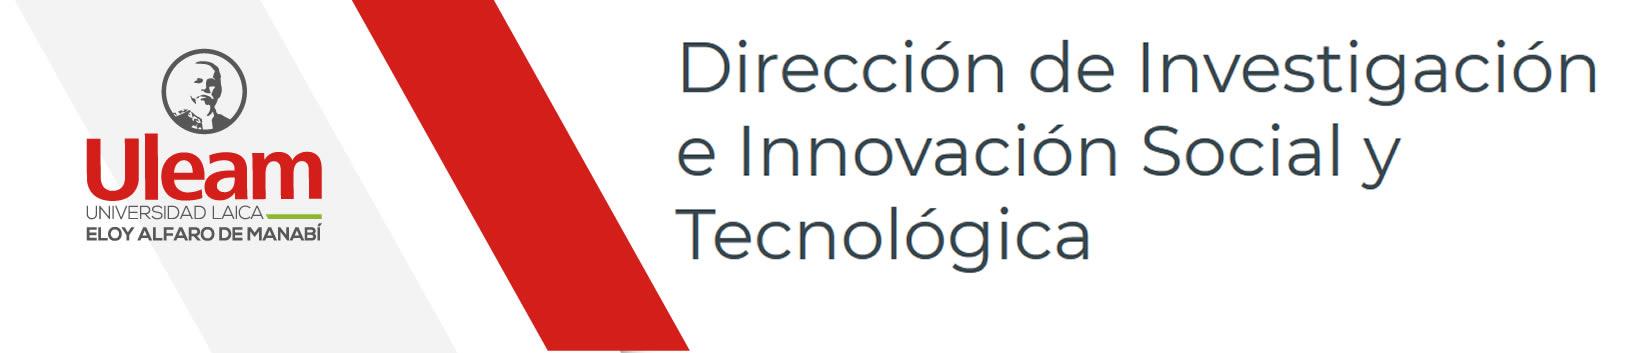 Dirección de Investigación e Innovación Social y Tecnológica